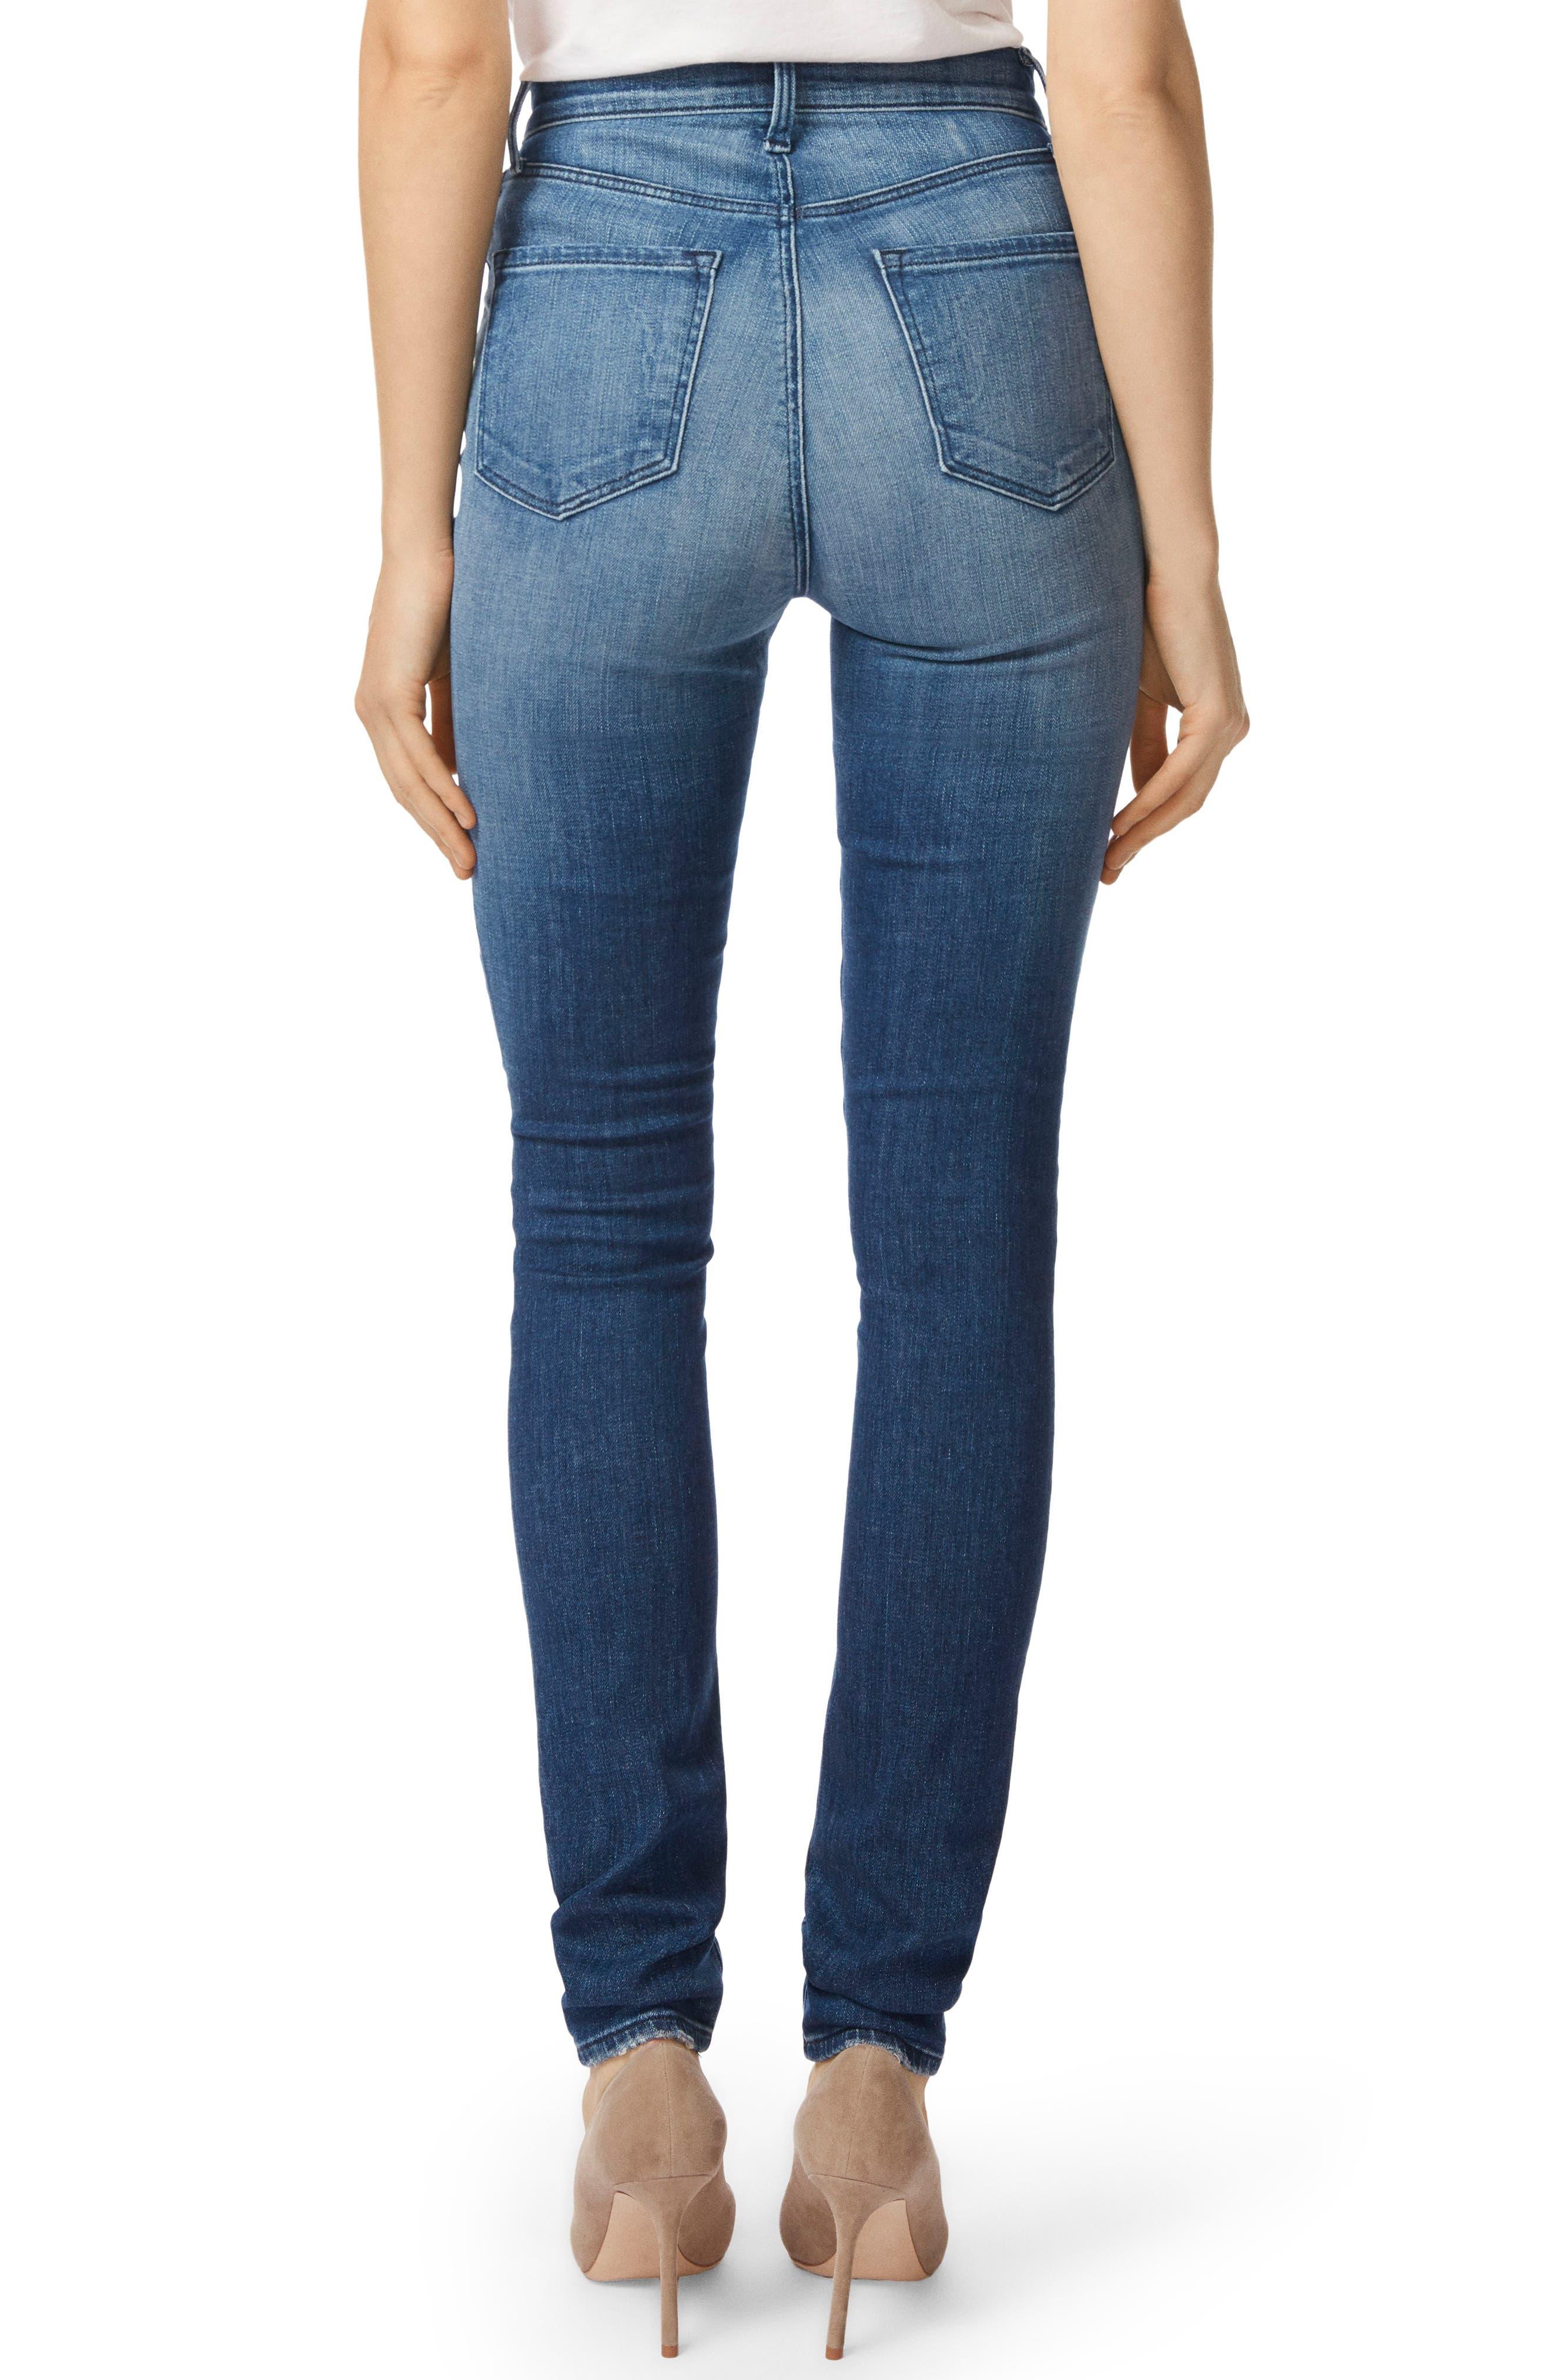 Carolina Super High Waist Skinny Jeans,                             Alternate thumbnail 2, color,                             Mystic